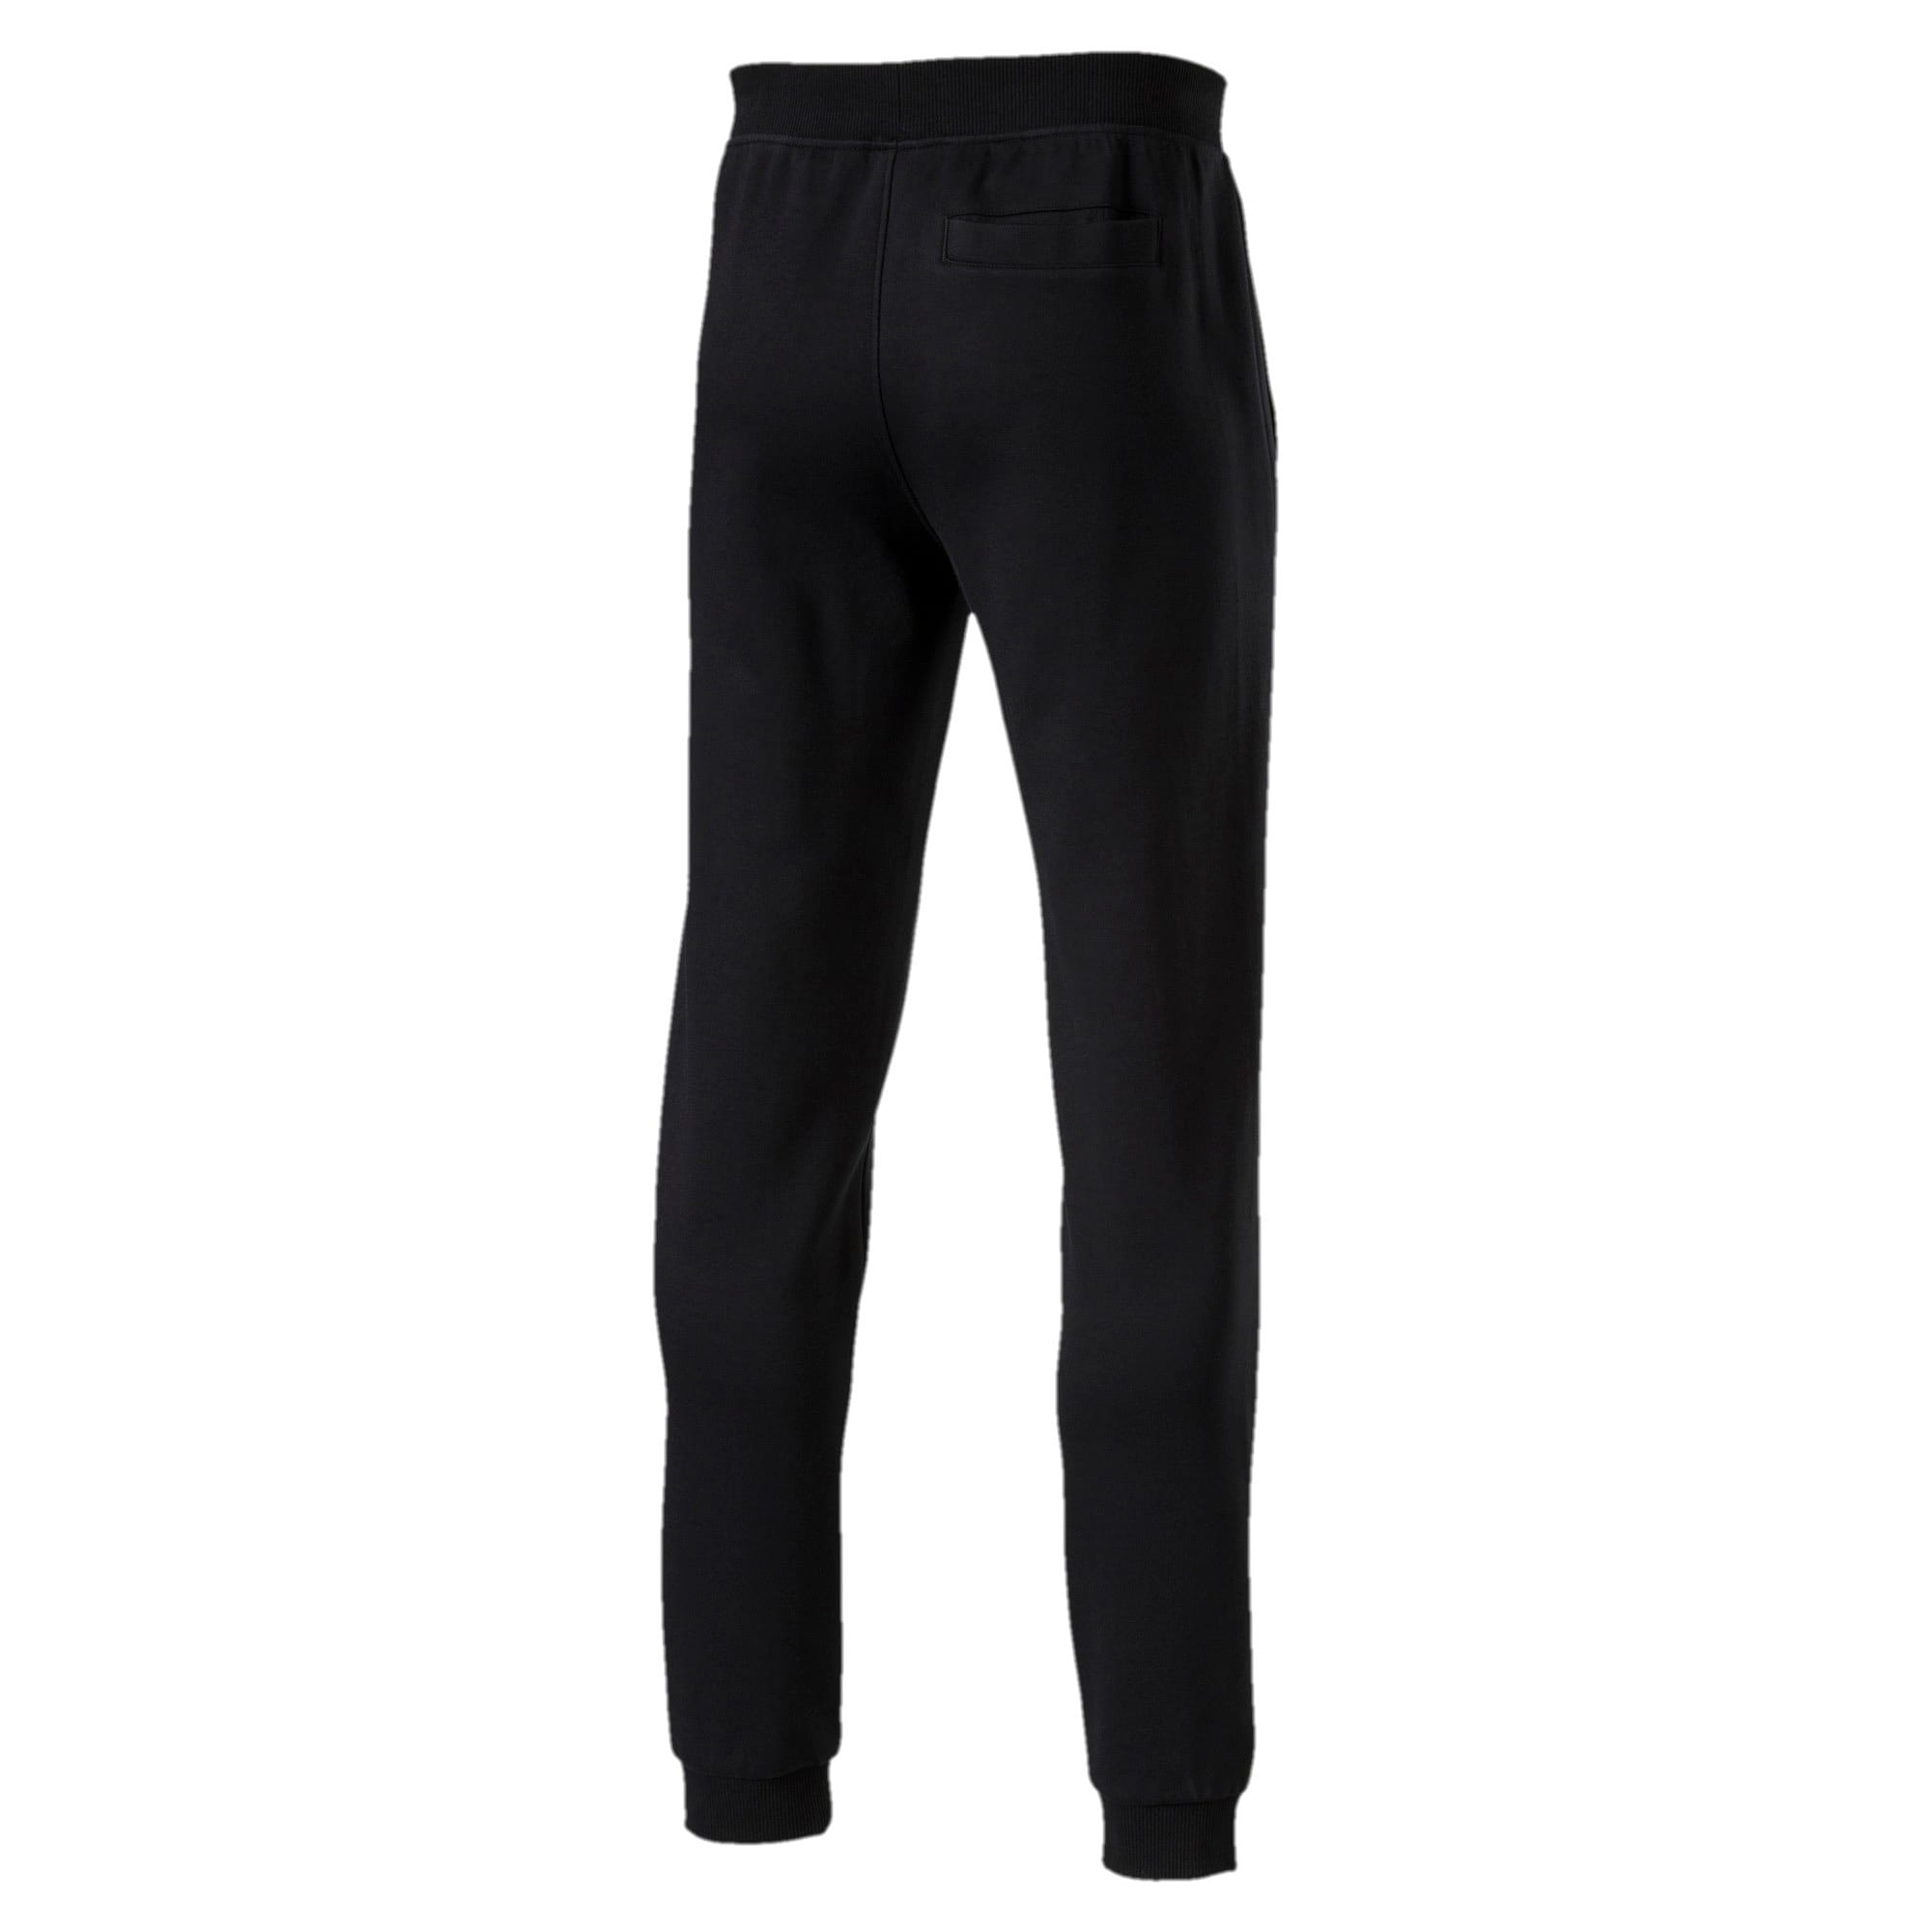 Thumbnail 4 of Ferrari Men's Sweatpants, Puma Black, medium